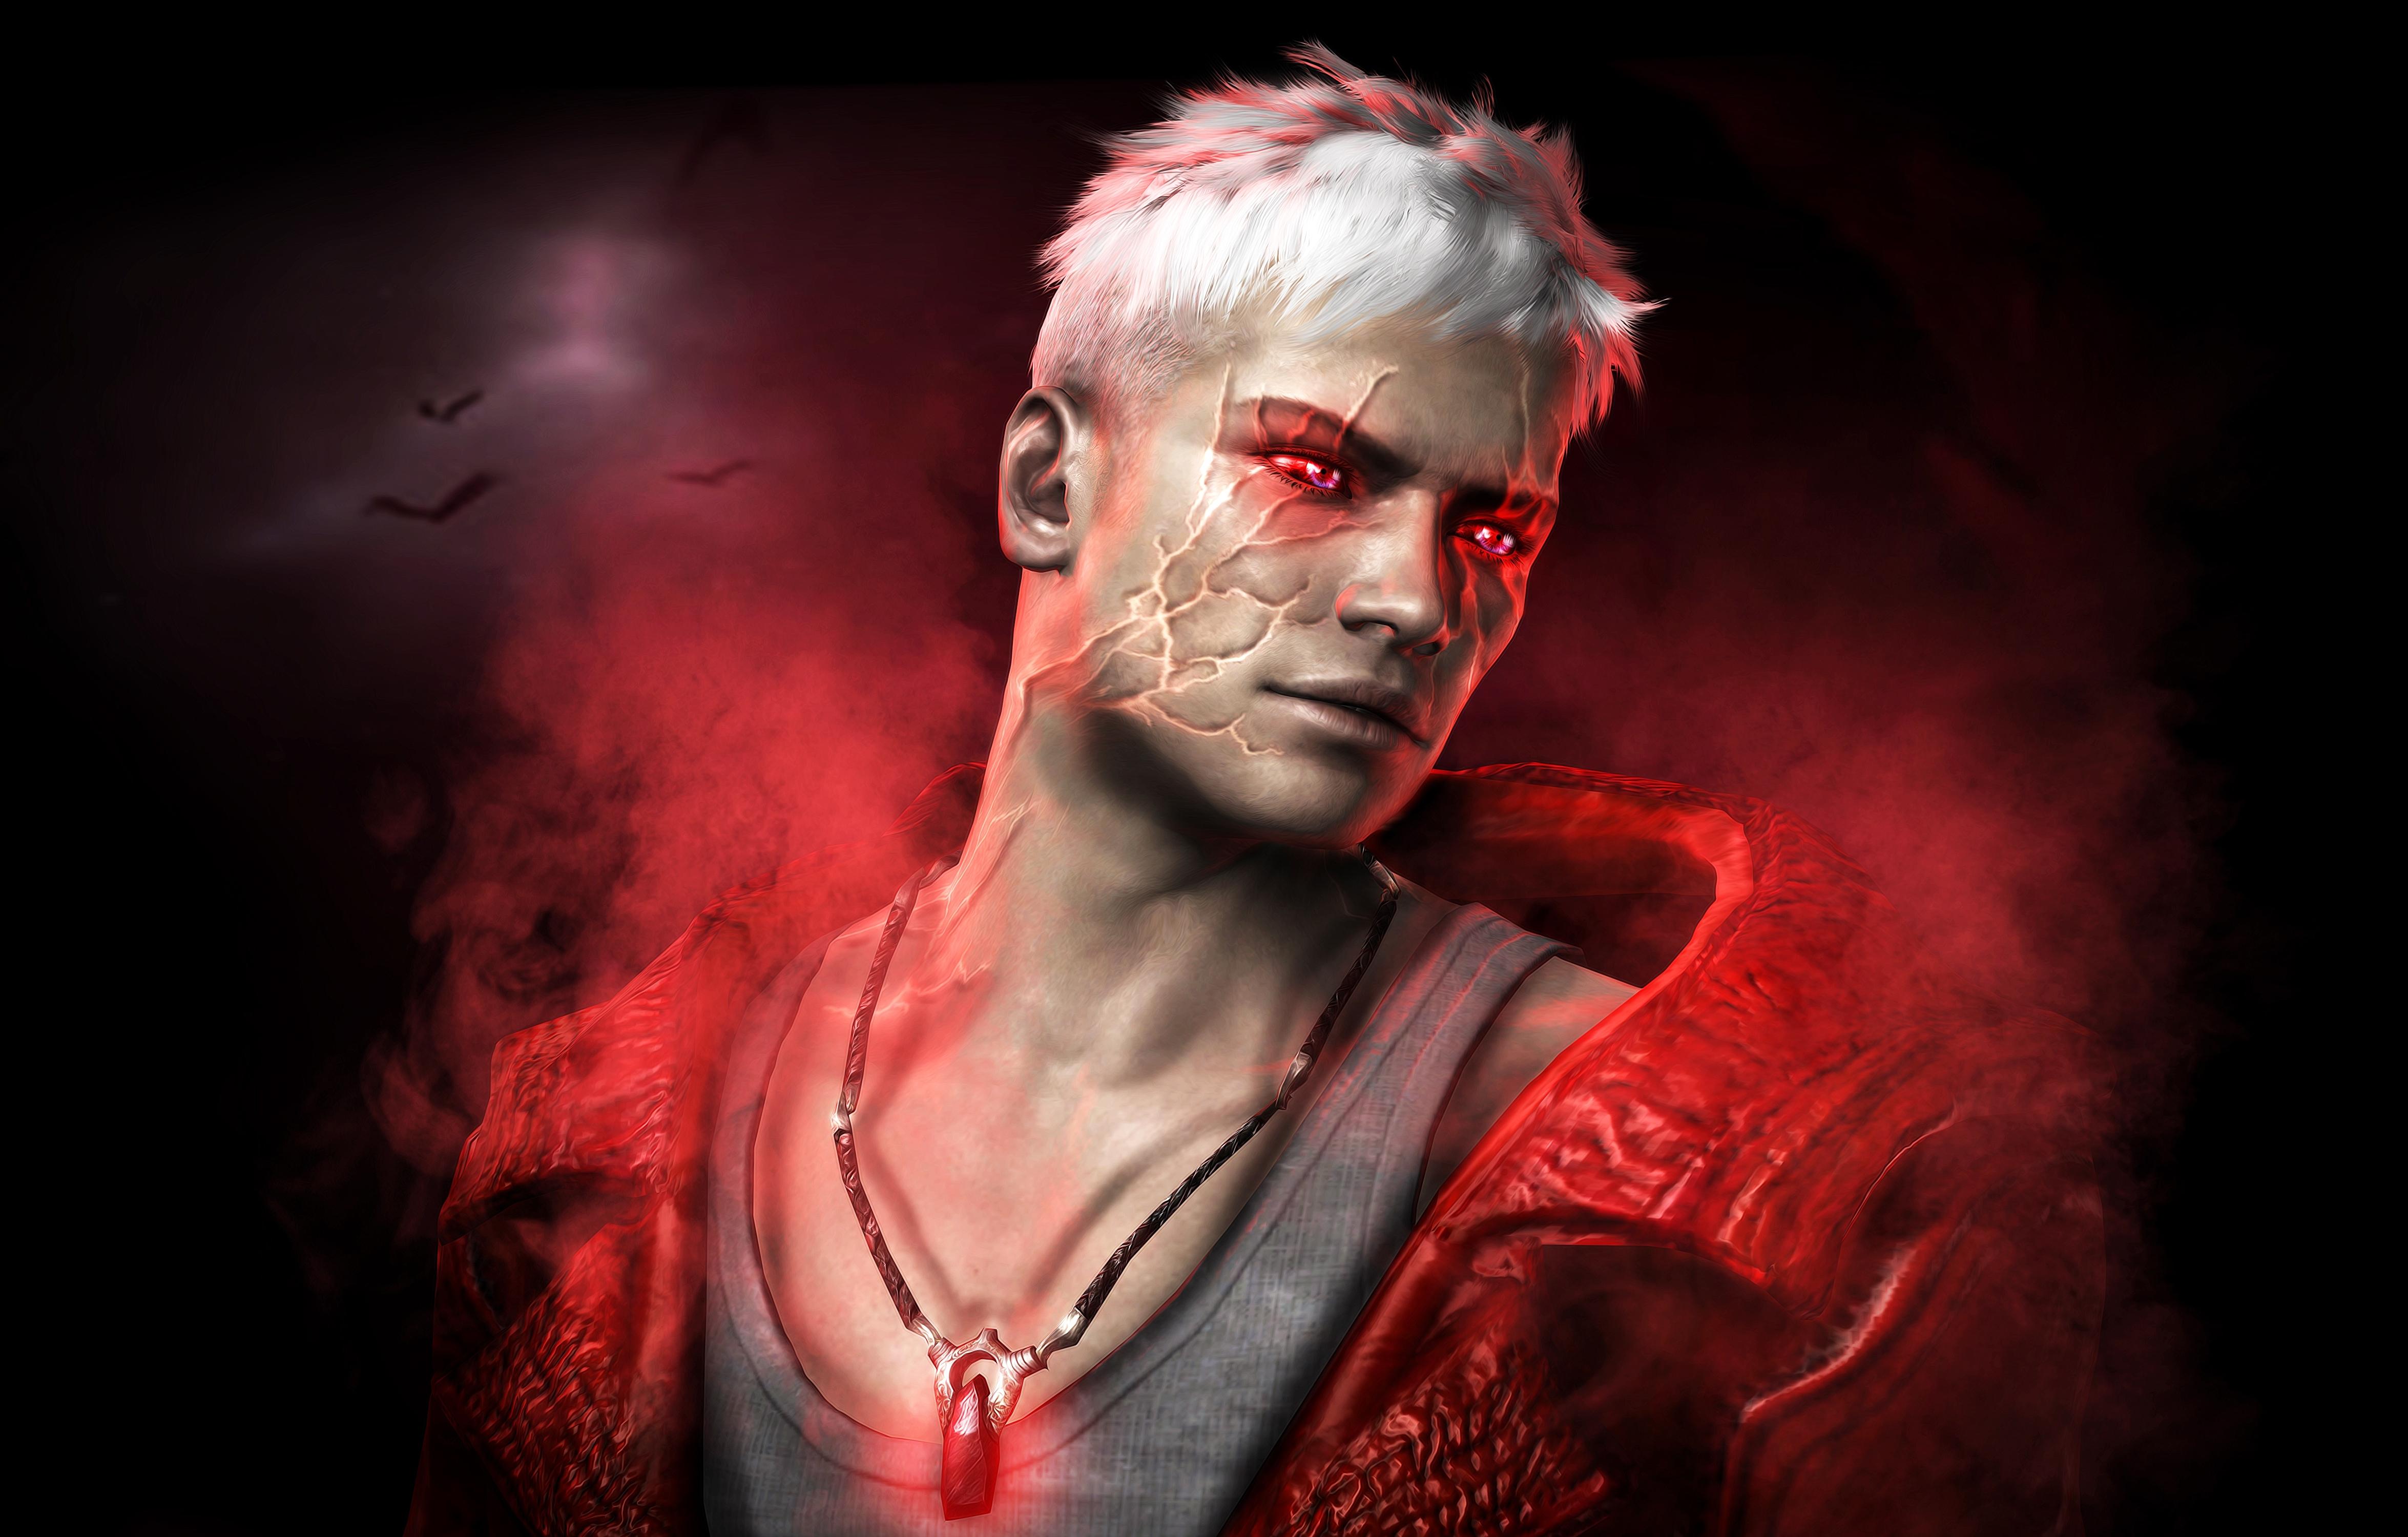 Devil May Cry Dante Wallpaper: Devil May Cry Dante Wallpaper